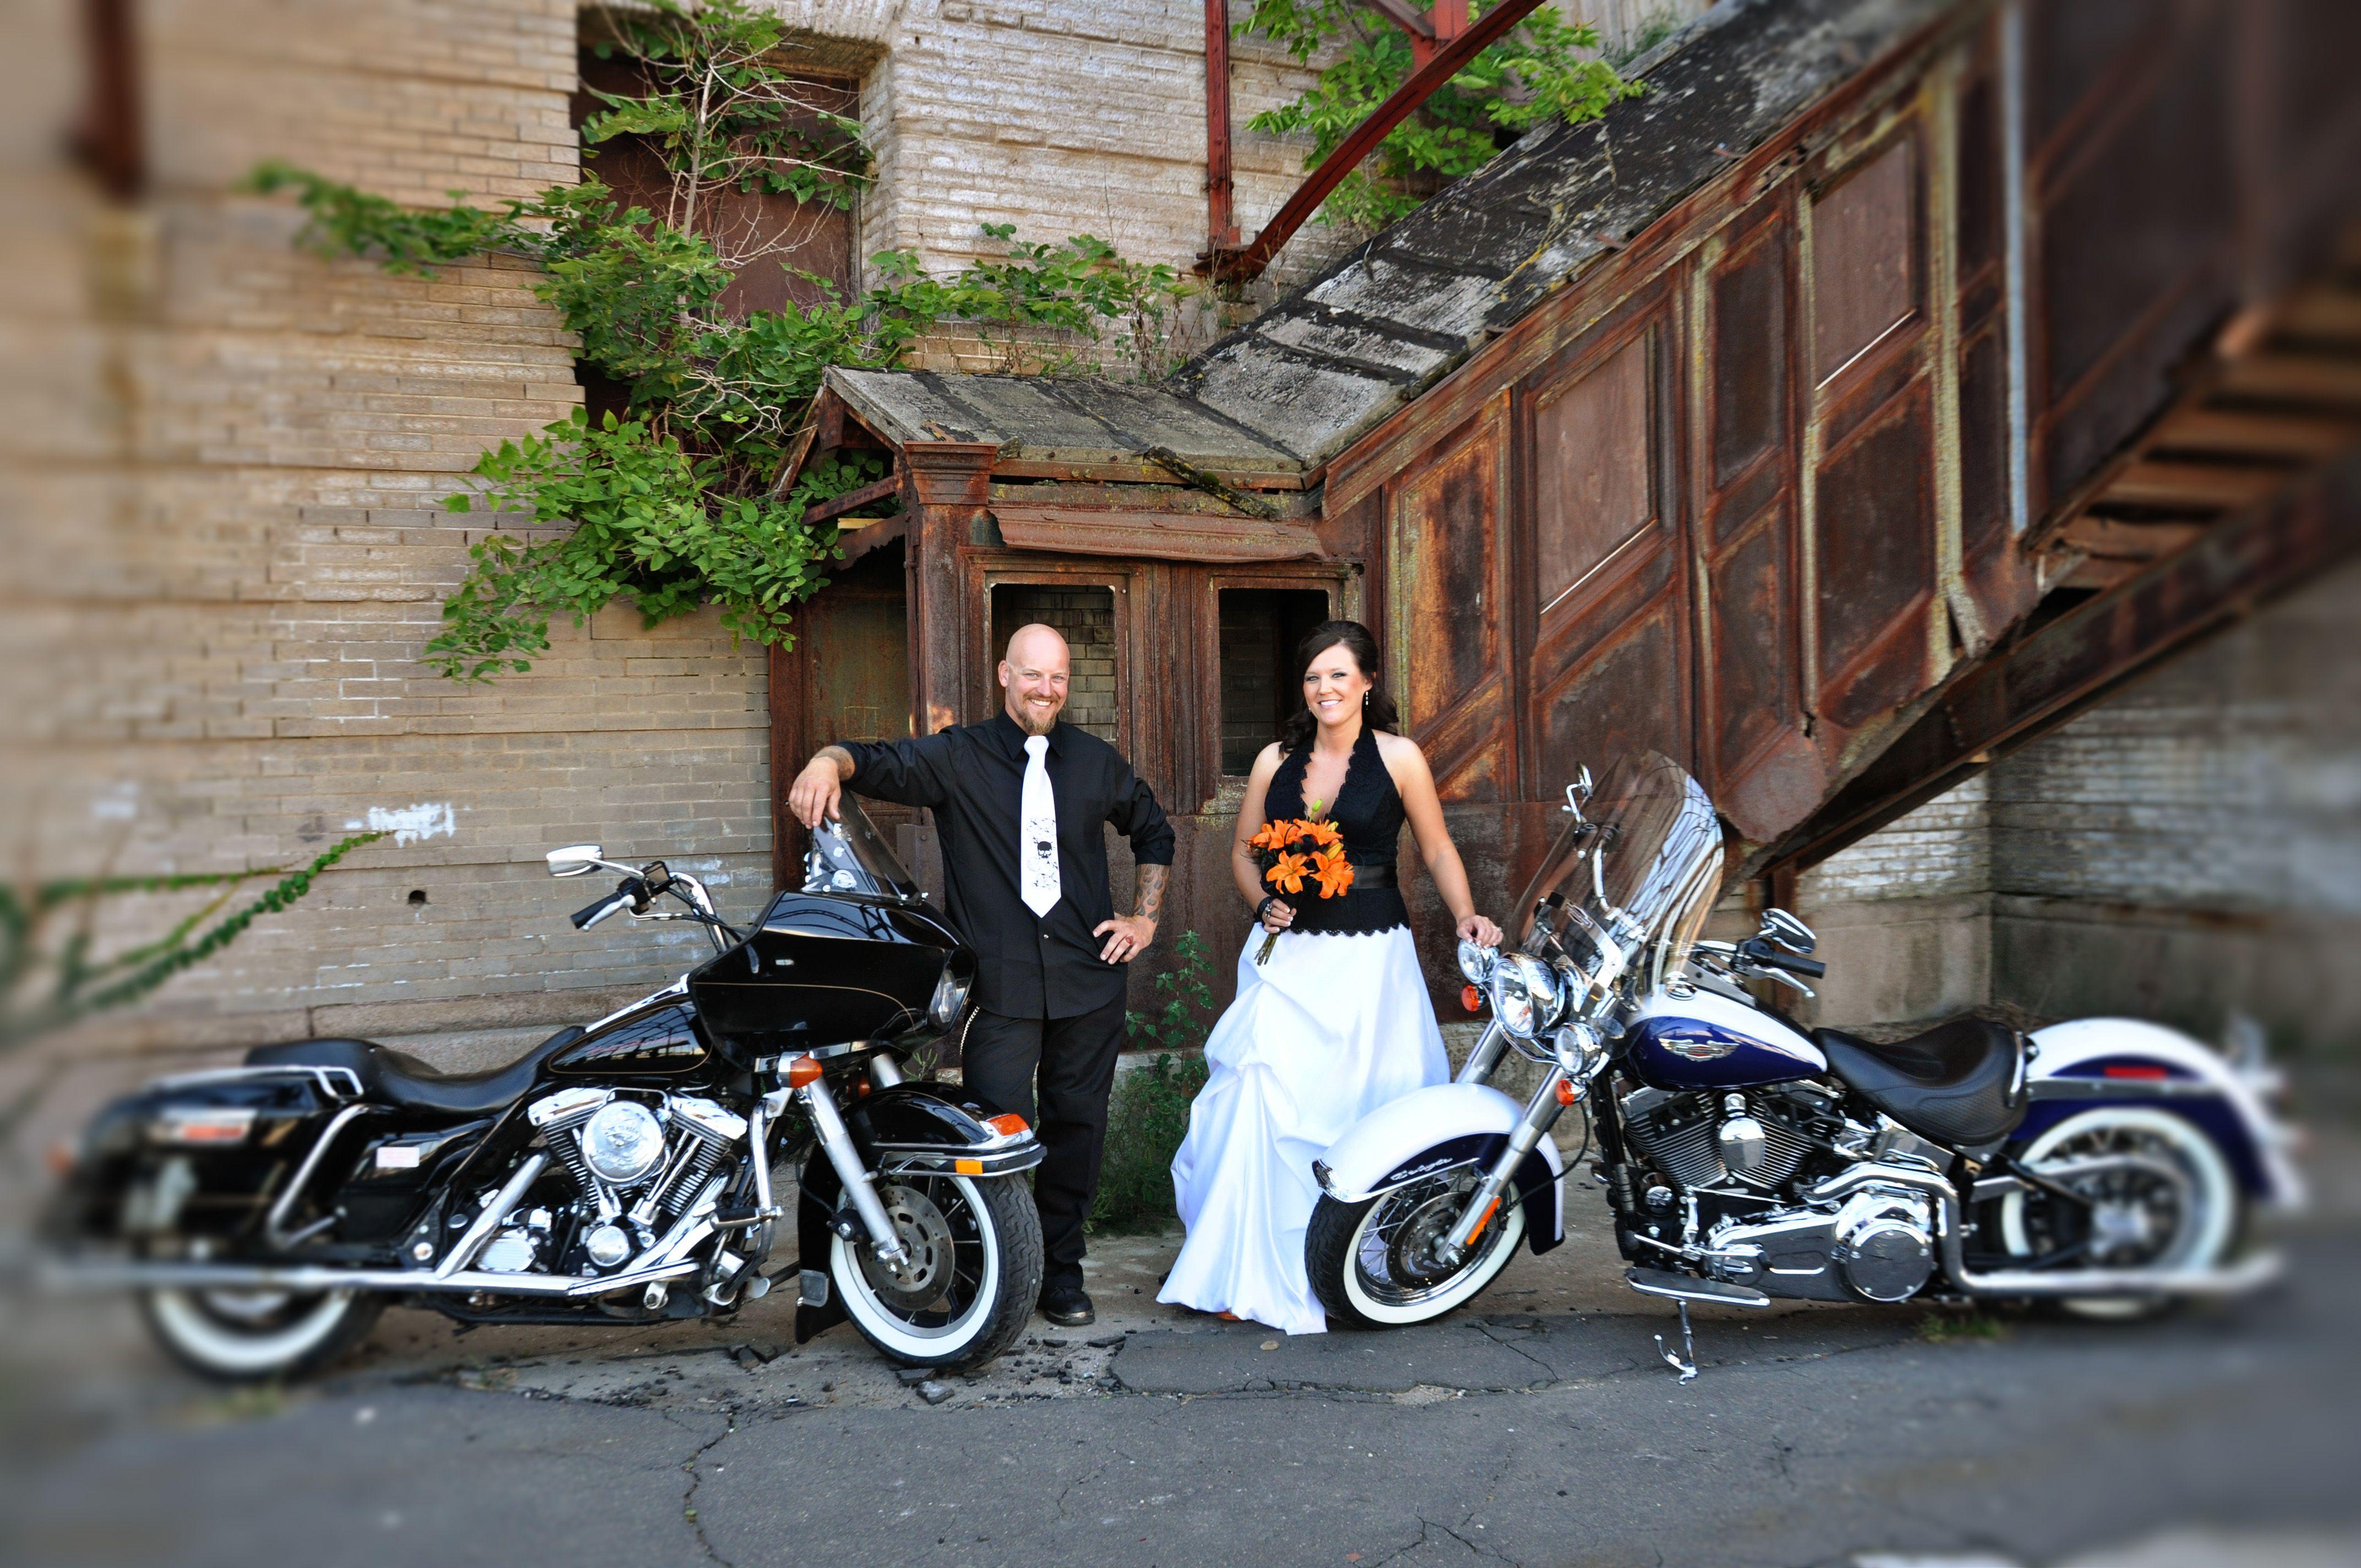 harley davidson wedding dresses harley davidson wedding Our Harley Davidson Wedding Part 1 Harleys and Heels